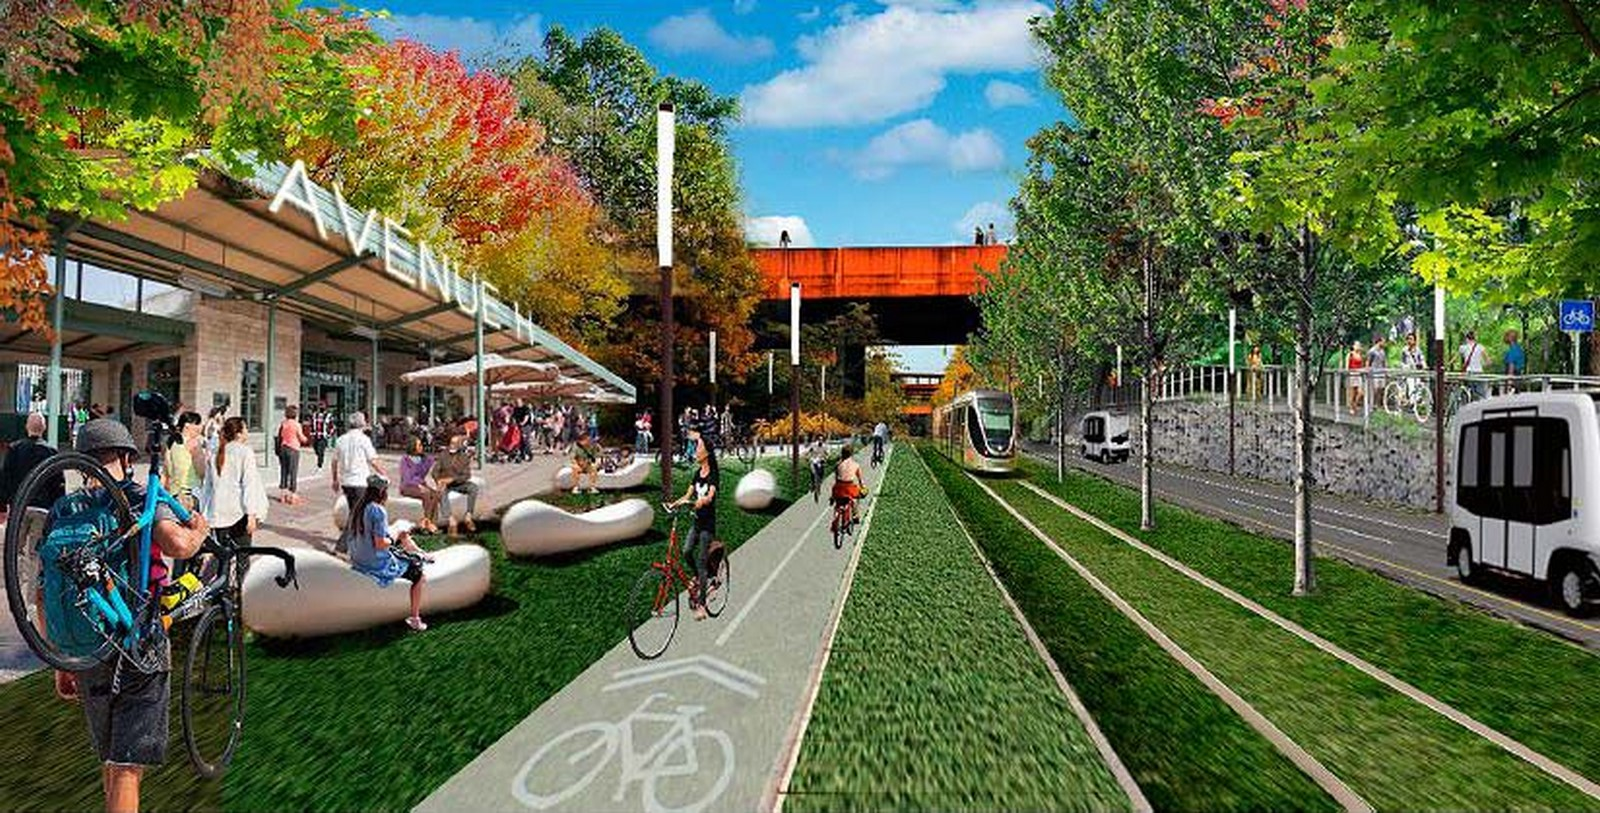 Gensler- 10 Cities & Urban Design Projects Sheet24